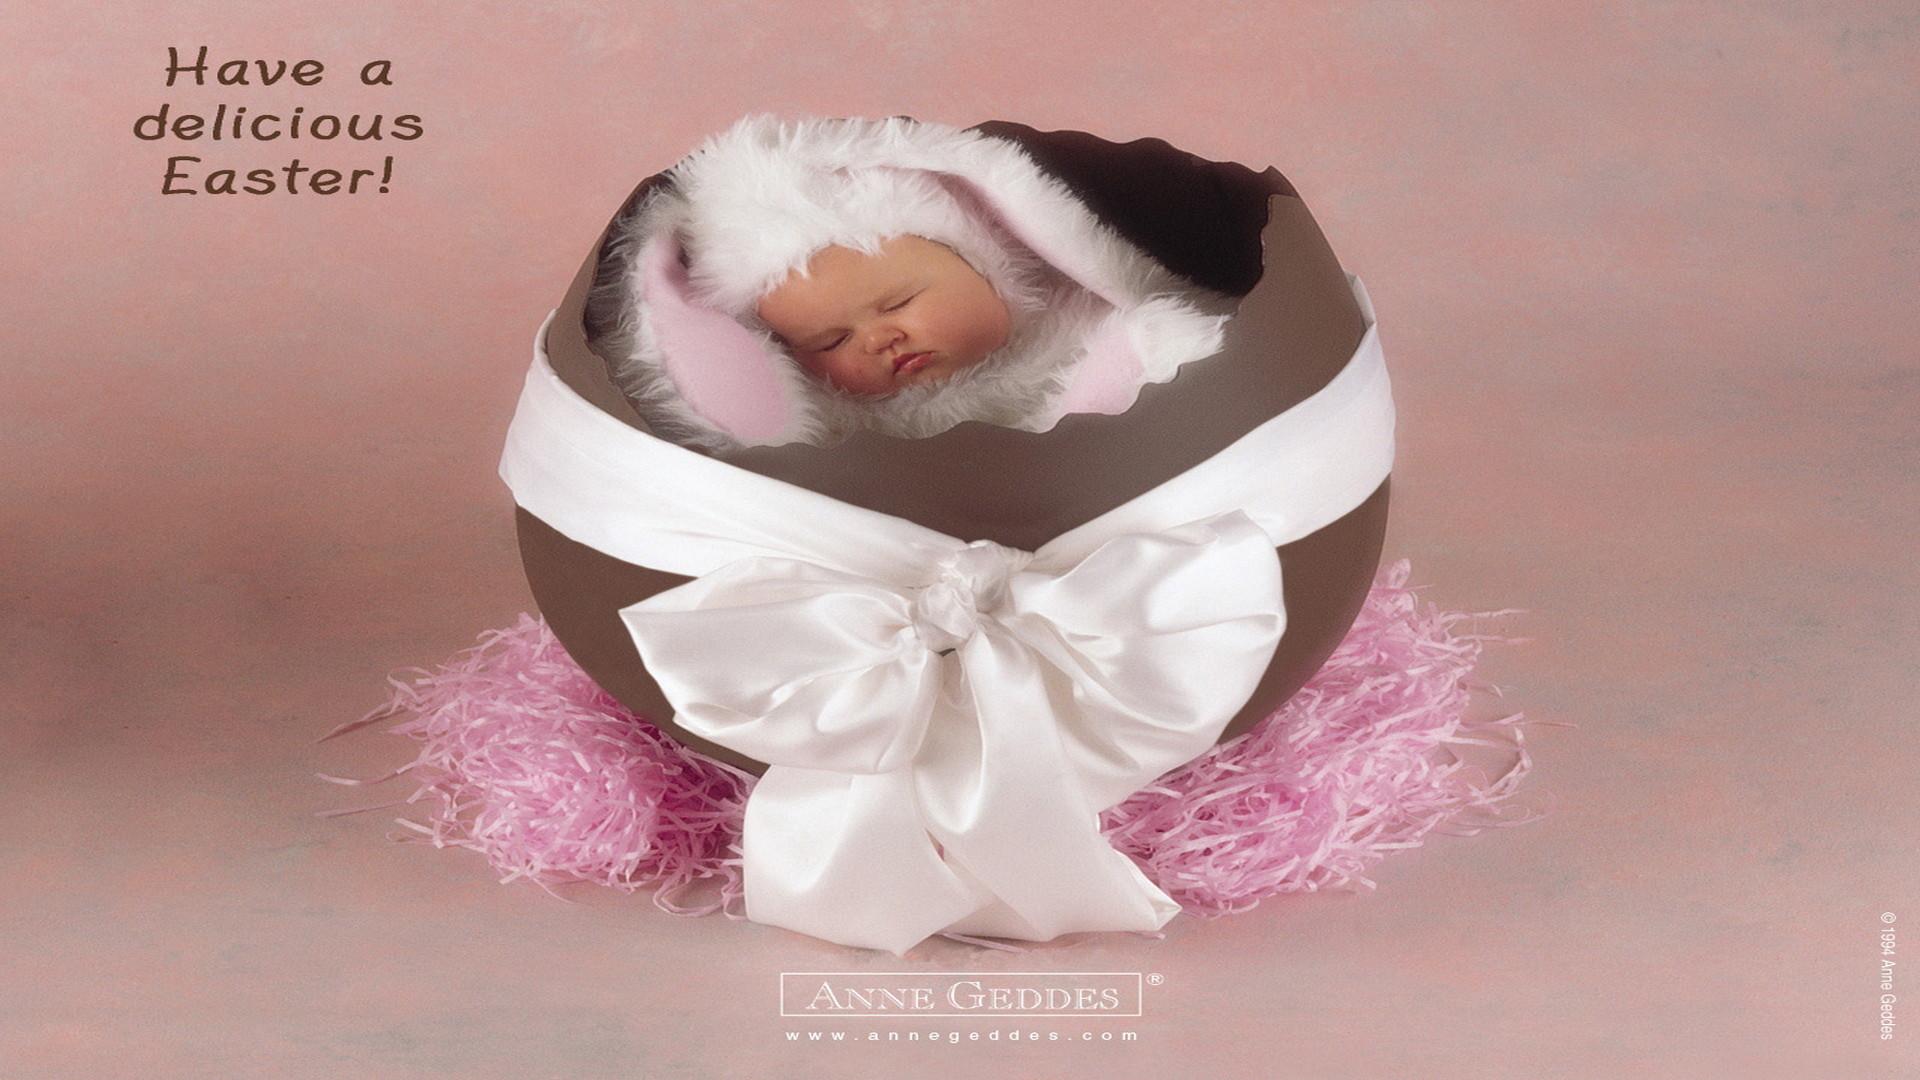 Cute Baby Angel Wallpaper Anne Geddes Wallpaper 183 ①